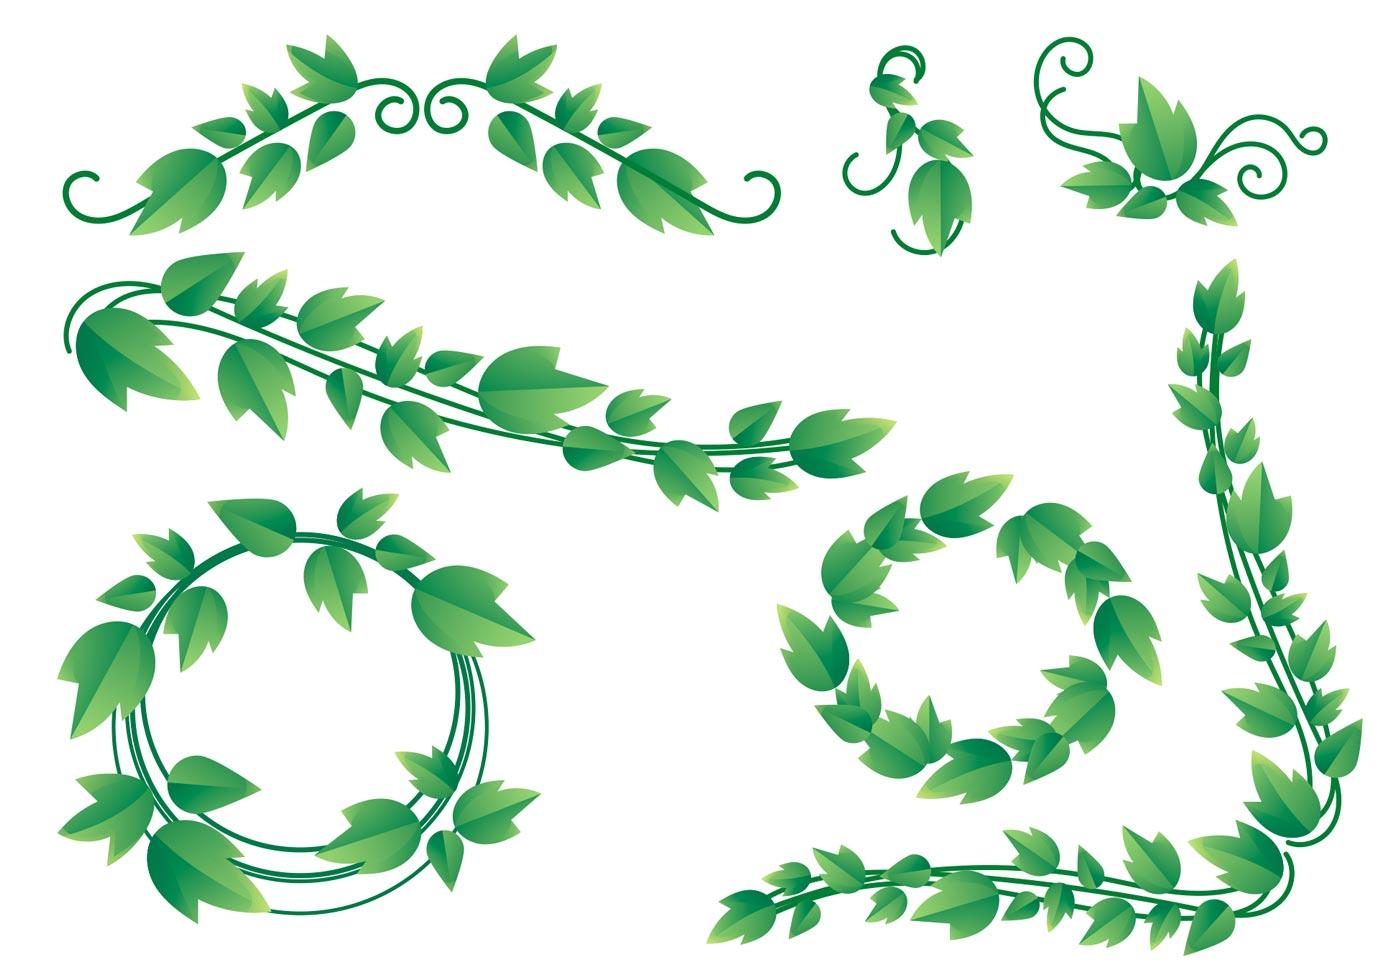 Lovely Ivy Vine Vectors - Download Free Vectors, Clipart ...